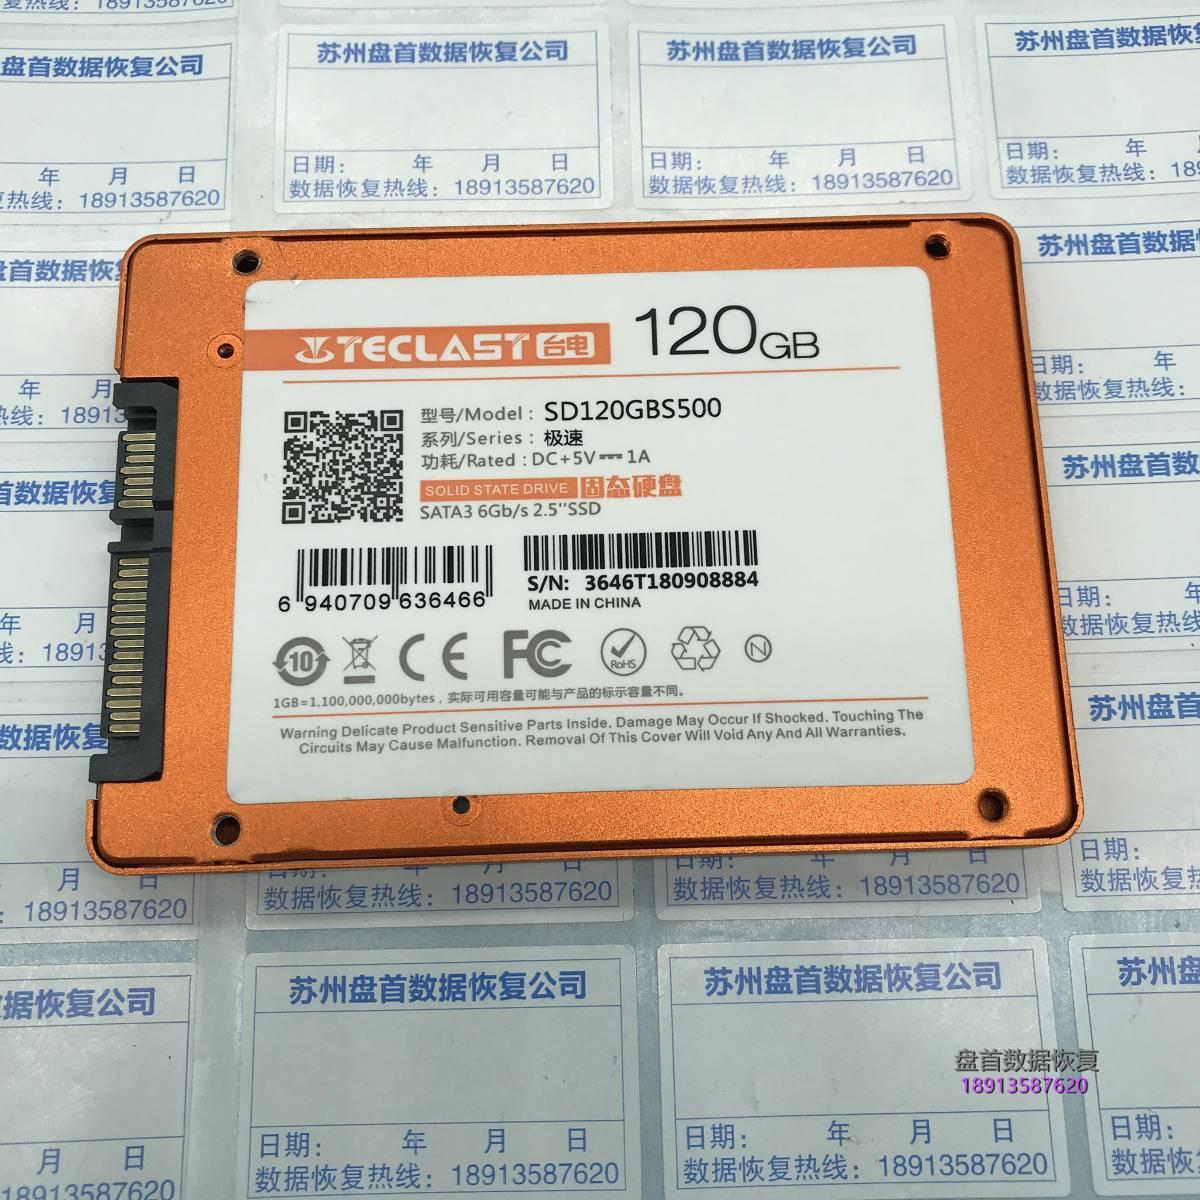 SM2258XT主控芯片损坏导致SSD无法识别无法读取数据恢复成功